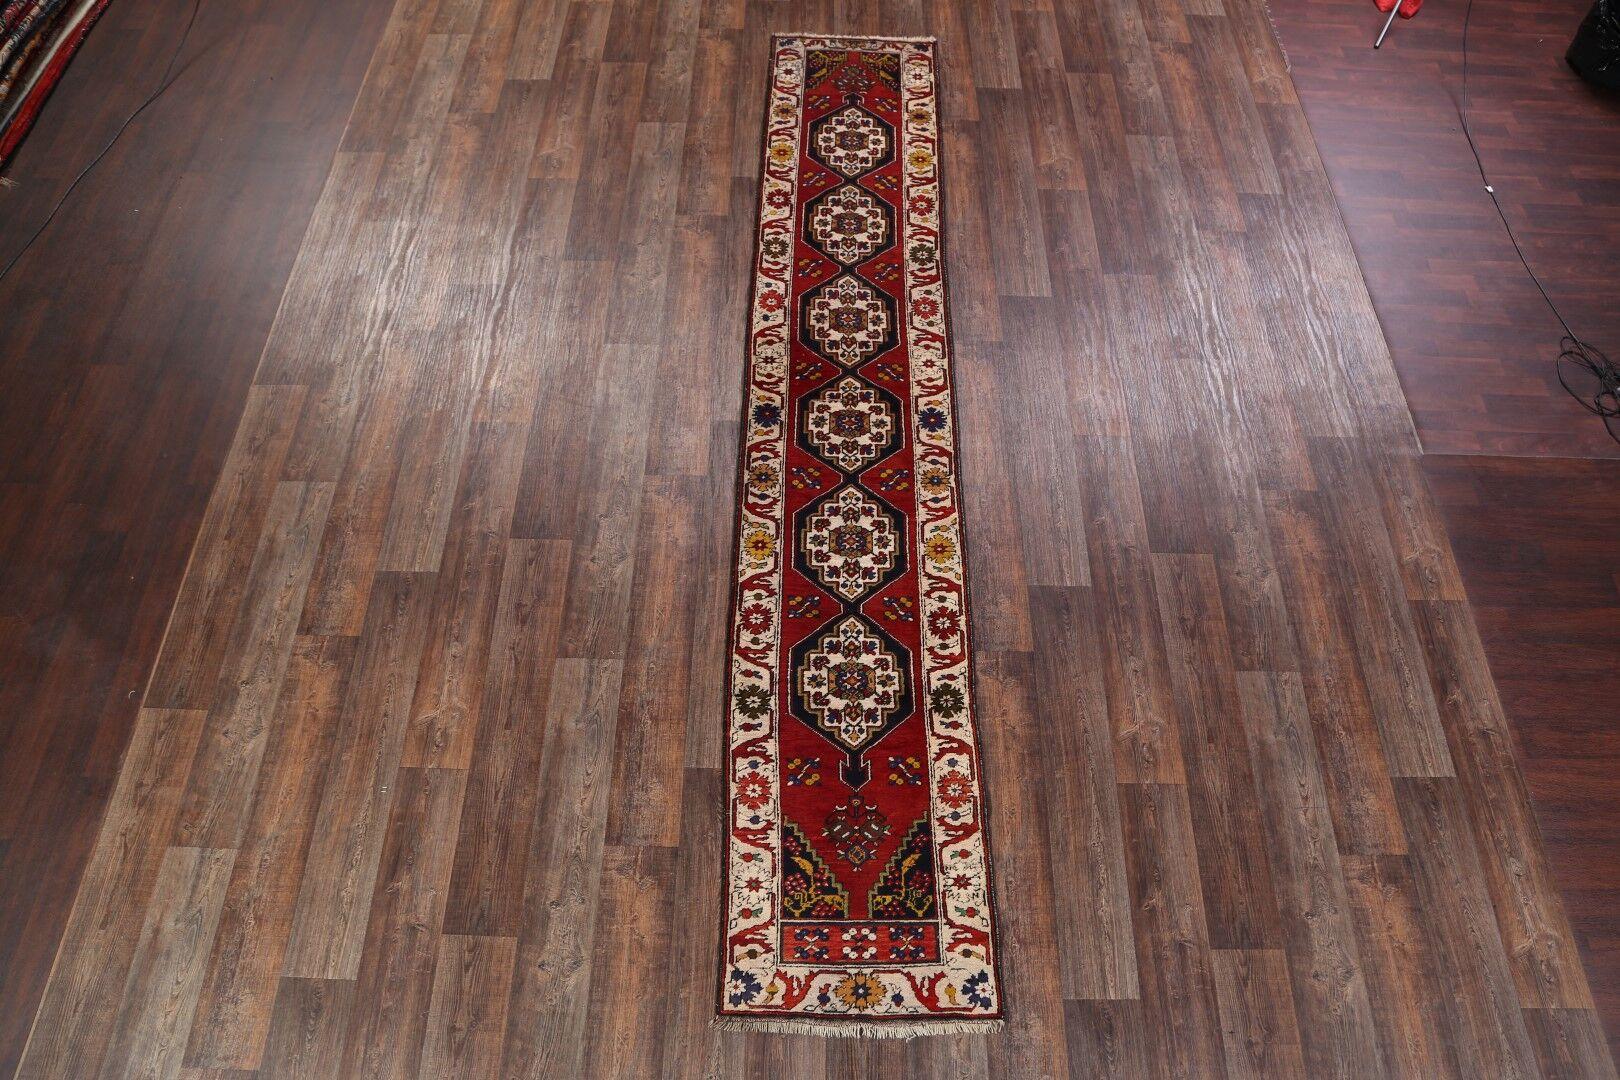 Decaro Kazak Russian Hand-Knotted Wool Red/Burgundy Area Rug